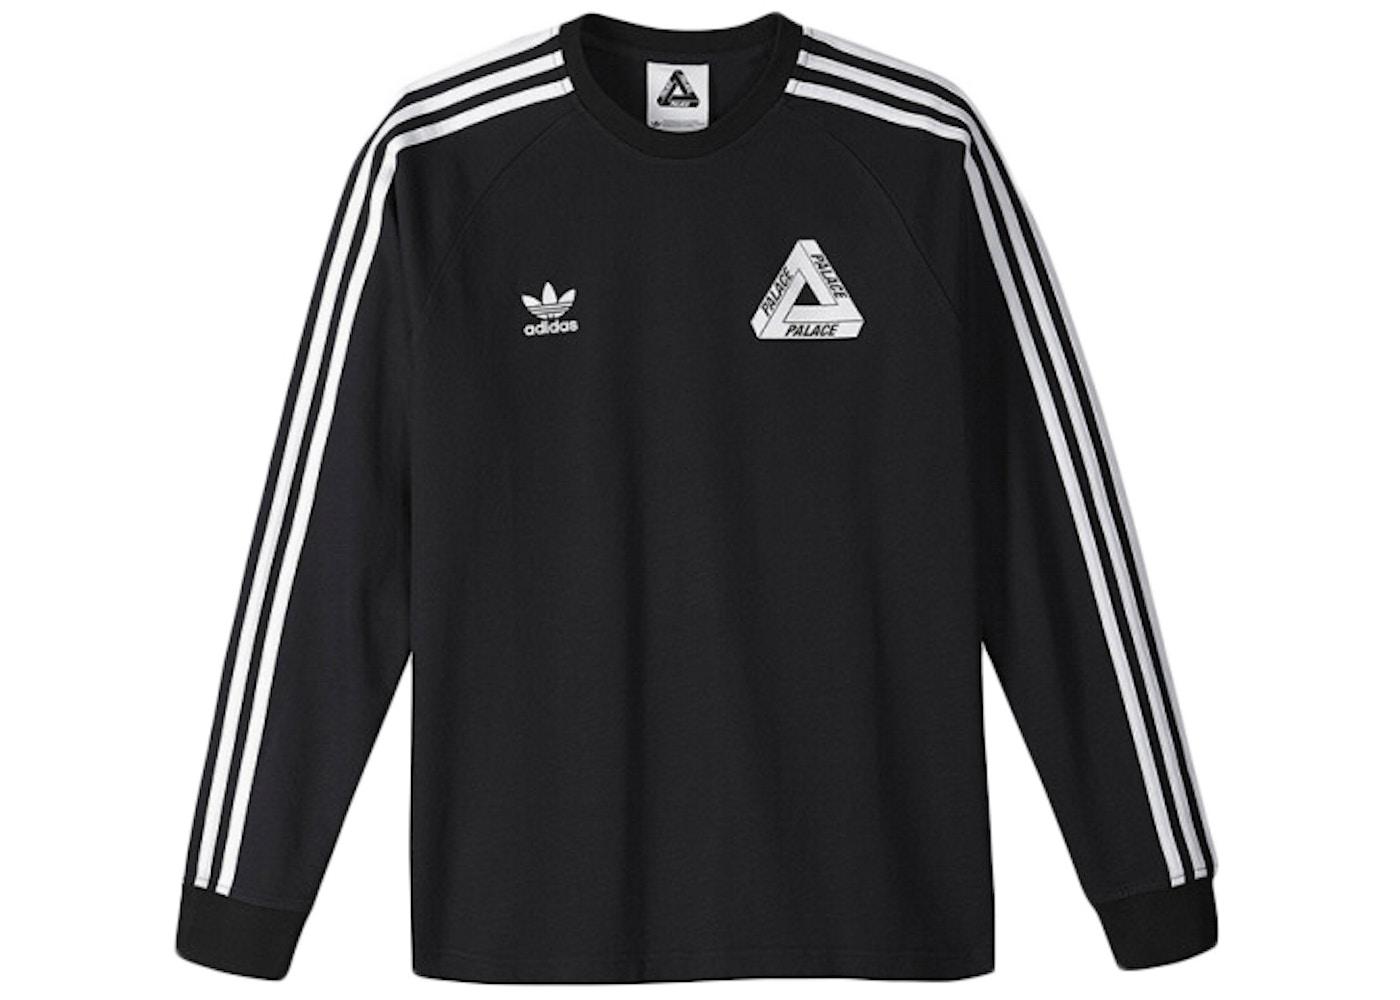 f8ca0c0fbcdb9 Palace adidas Longsleeve Team Shirt Black - SS15